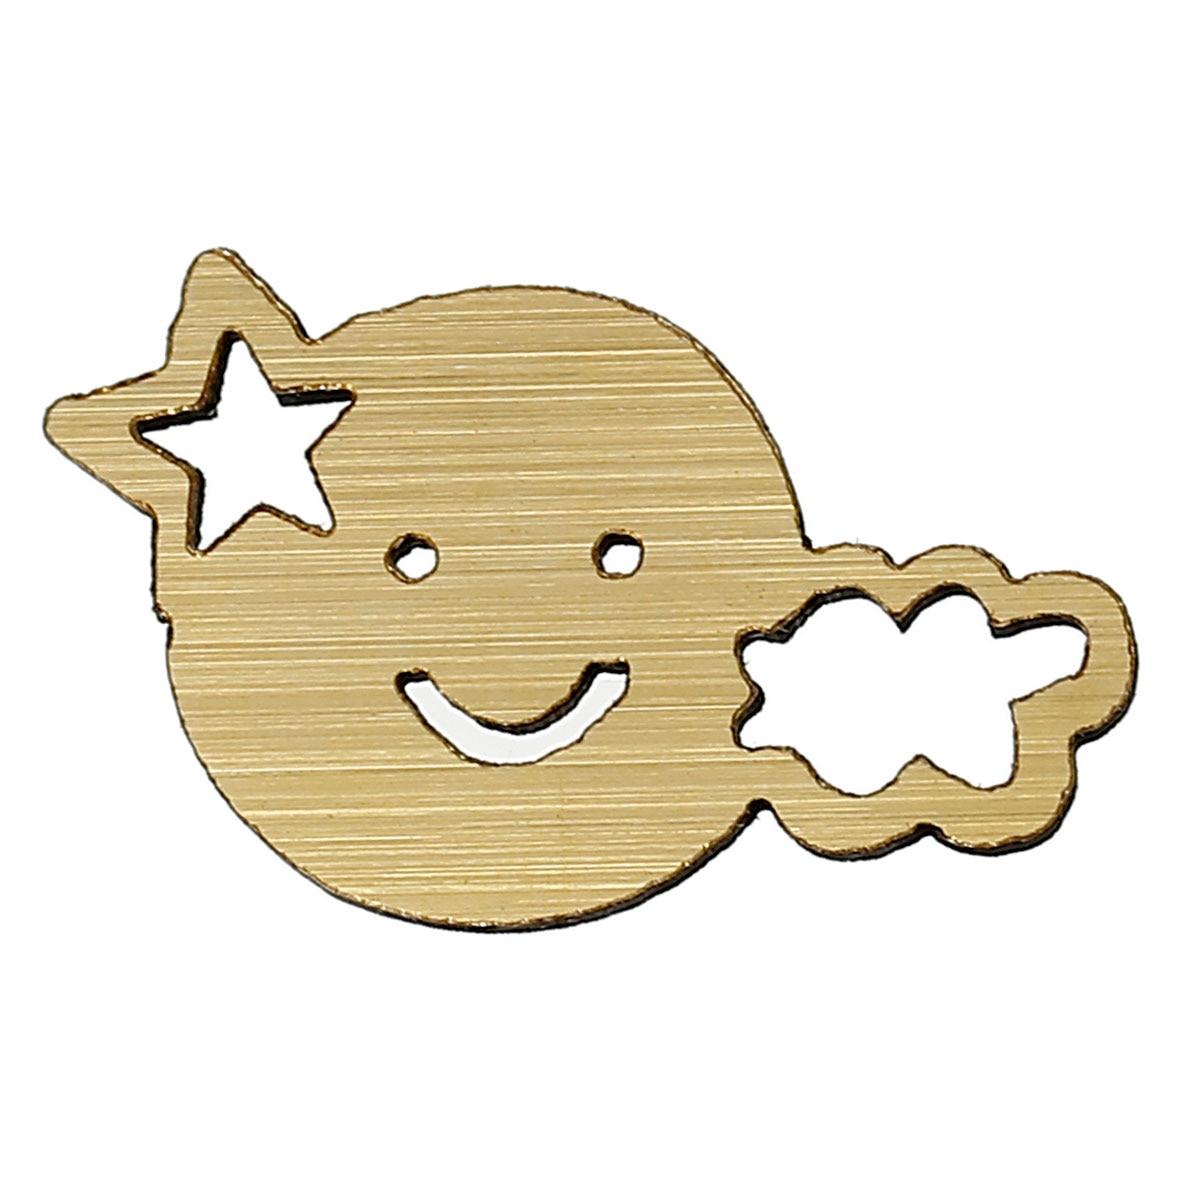 DoreenBeads Wood Cabochons Scrapbooking Embellishments Findings Cloud Golden Smile Star Hollow 32mm(1 2/8)x 19mm(6/8),50 PCs